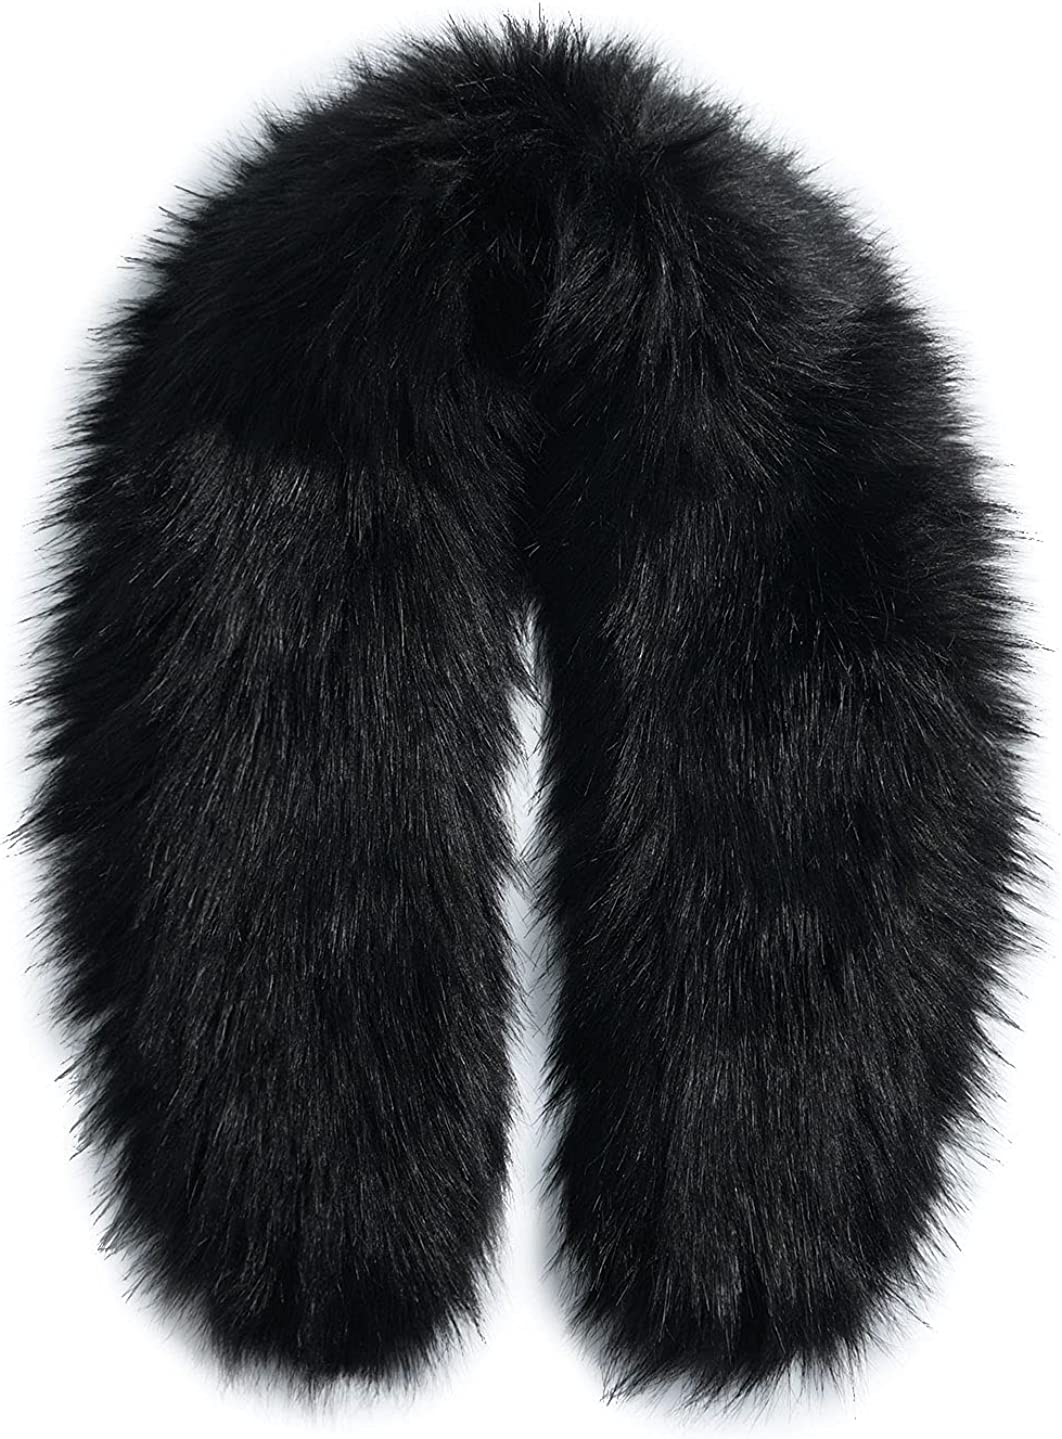 Faux Fur Collar Trim for Hood Replacement Fake Fur Scarf Winter